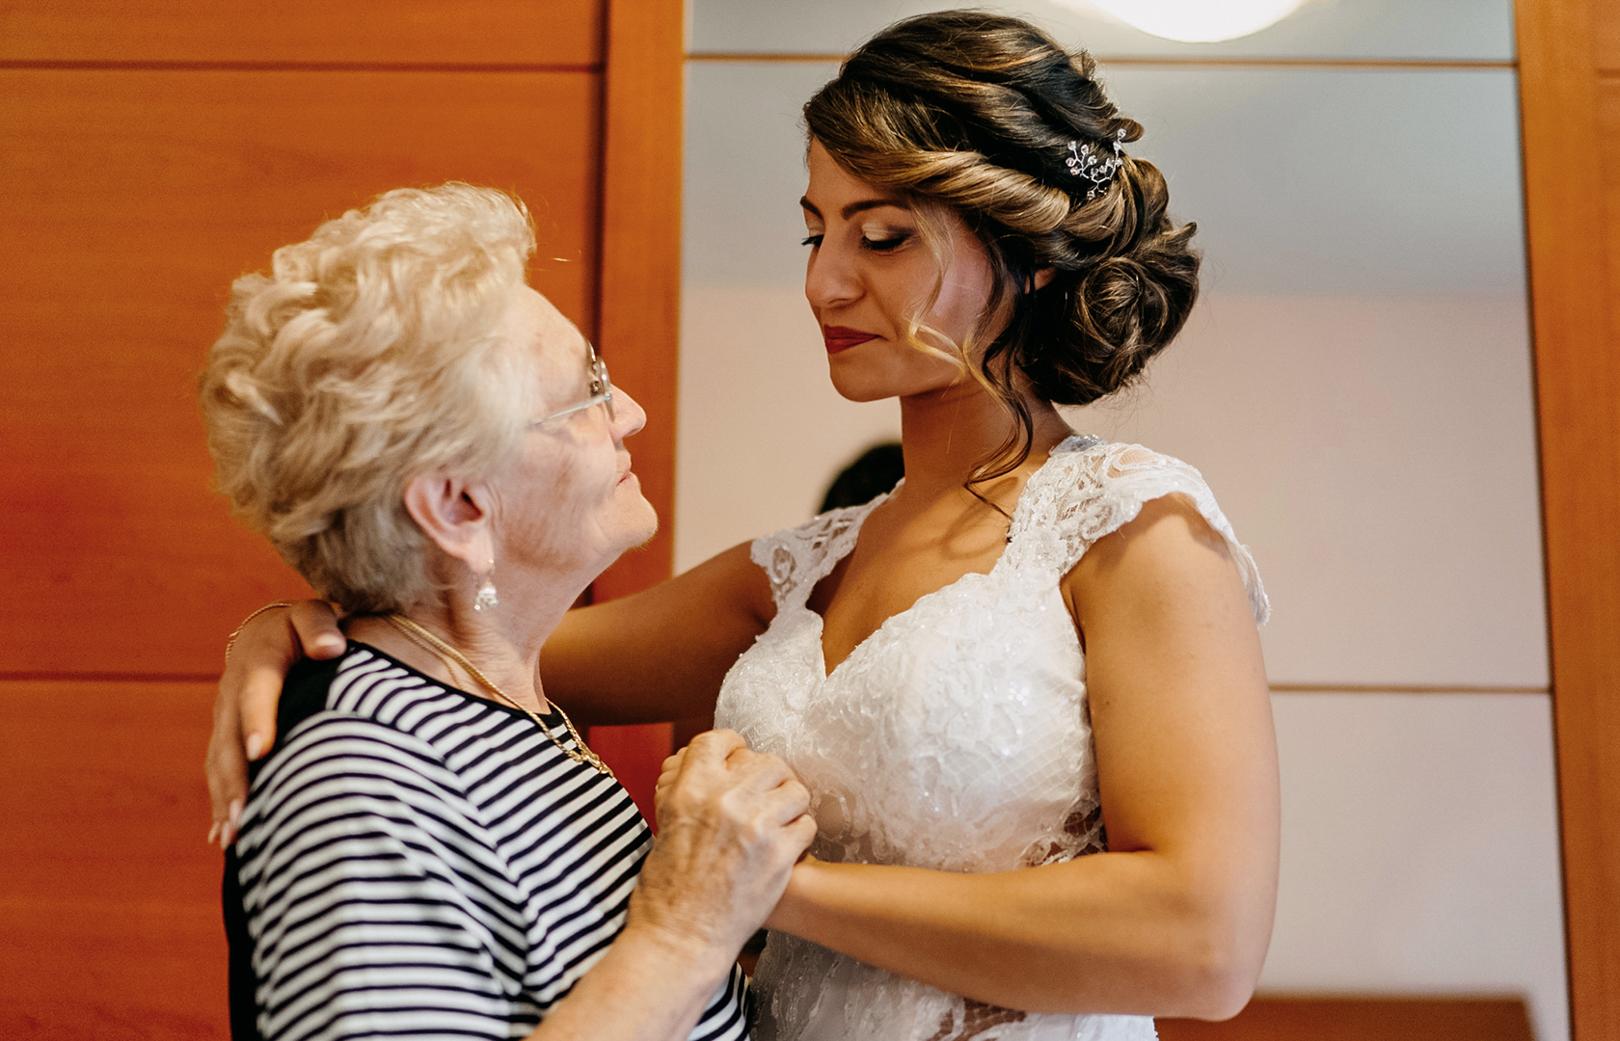 12 gianni-lepore-nonna-sposa